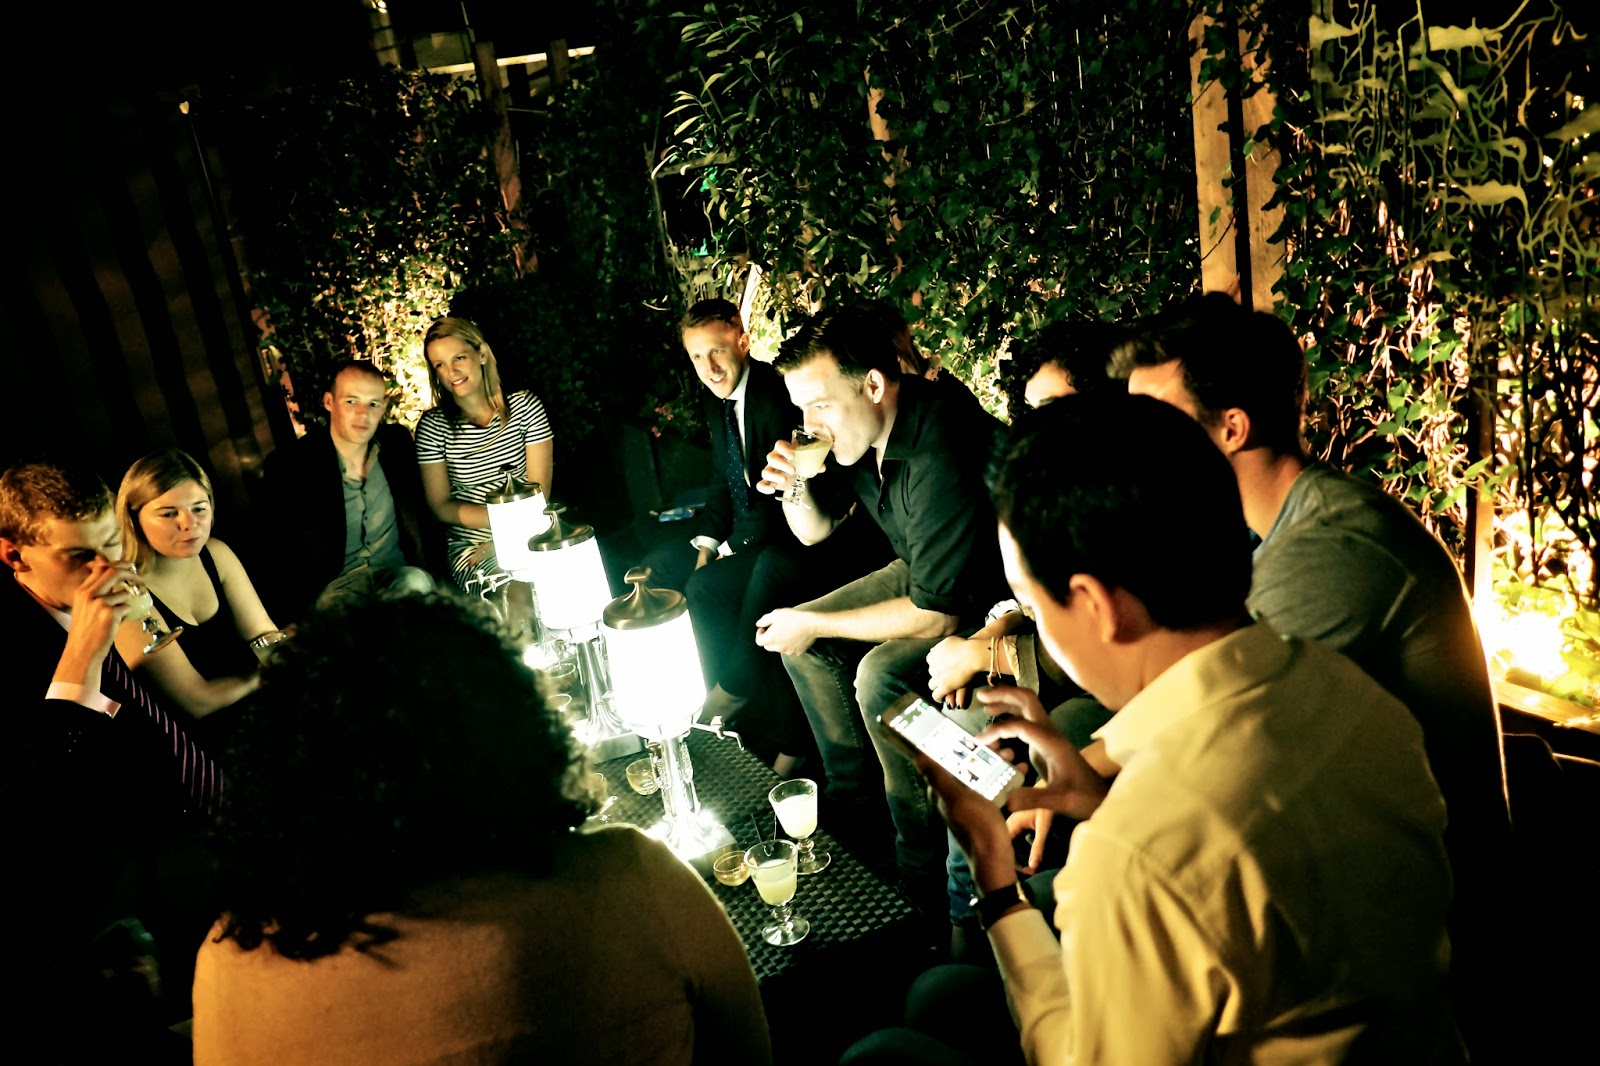 Pernod Ricard Abinsthe tasting at L'Atelier Joel Robuchon